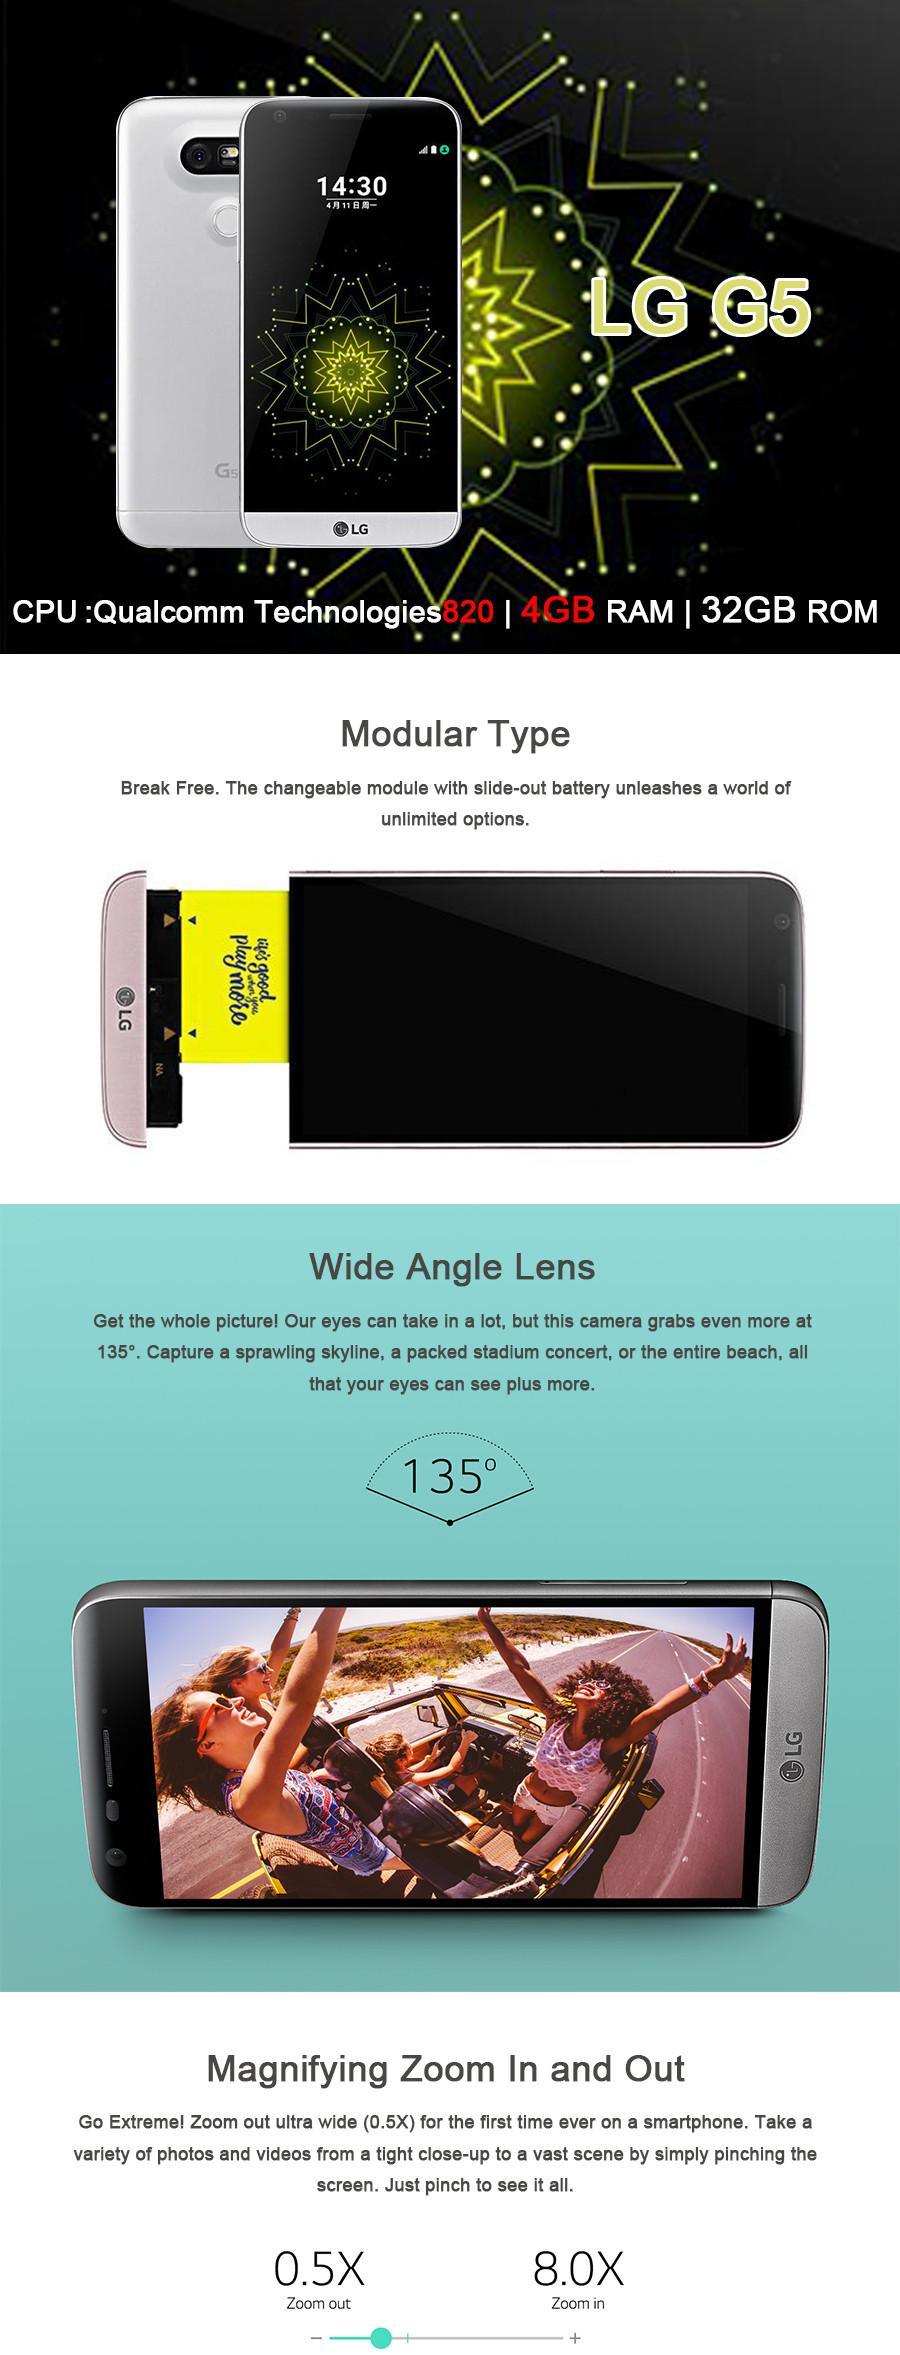 Original LG G5 4GB RAM 32GB ROM Mobile Phone 5.3″ Quad HD IPS Quantum 2560*1440 px snapdragon 820 16MP Camera 4G LTE CellPhone